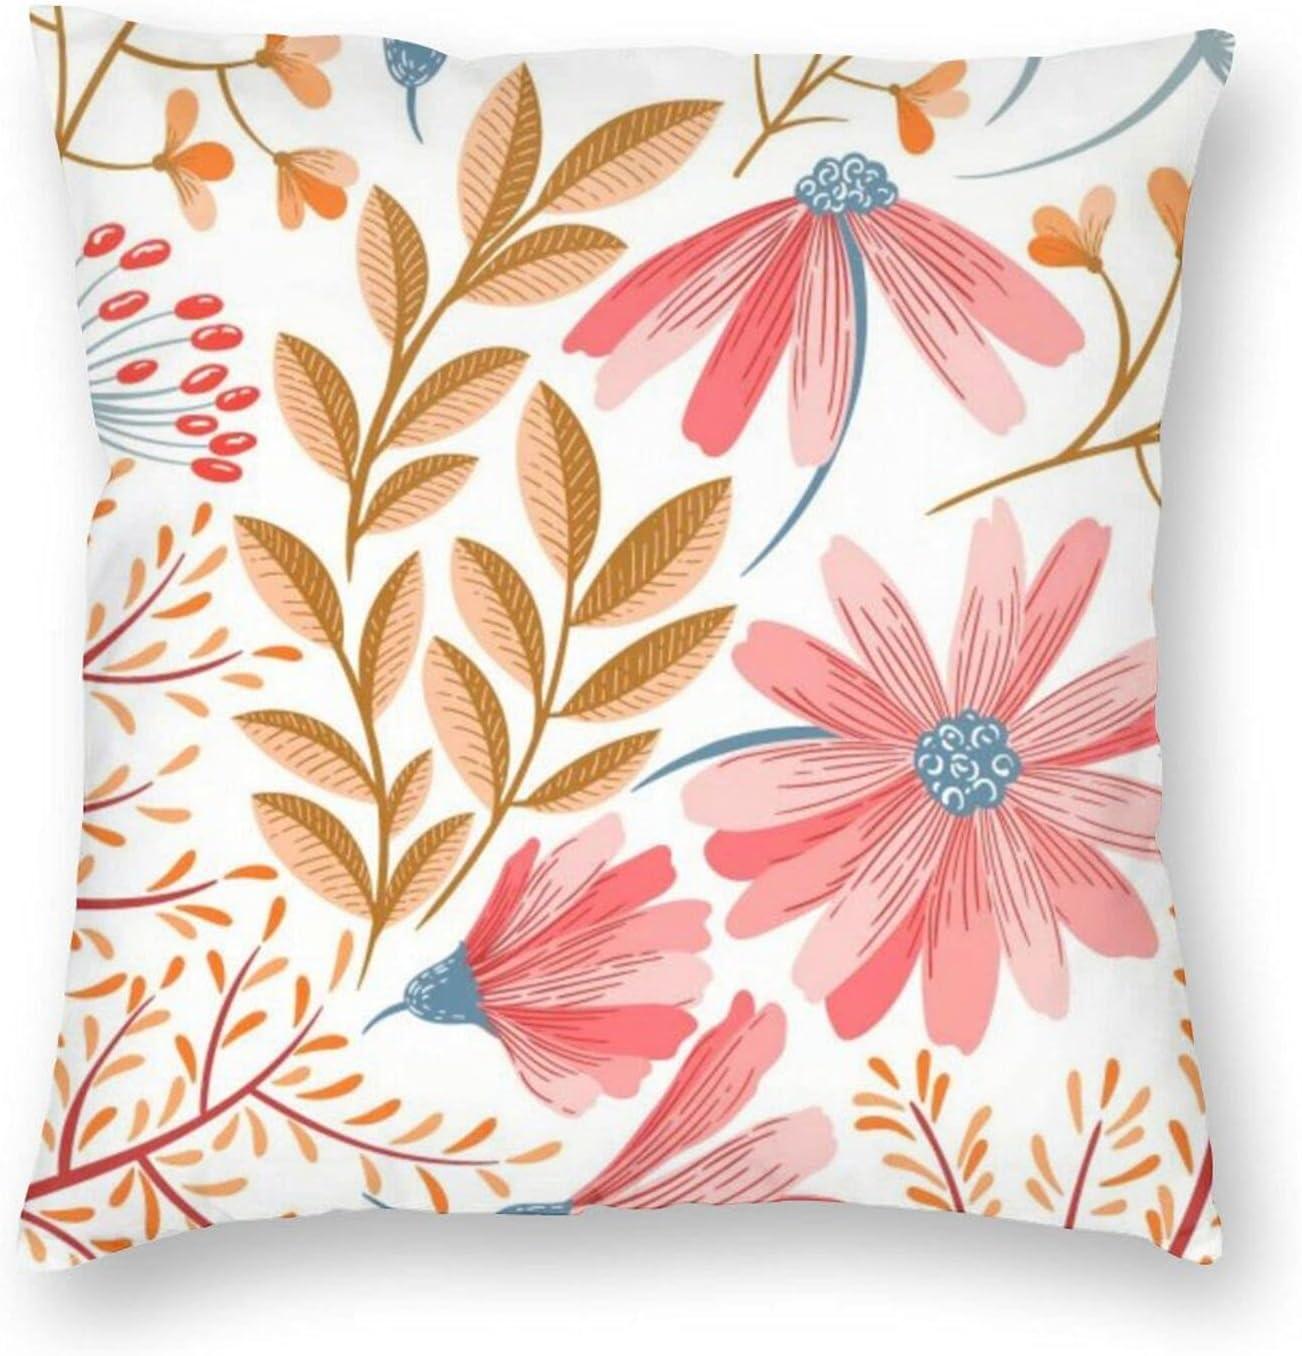 Regular store LineHern 100% Polyester Sale Square Pillowcase Multiple Sm Soft Sizes